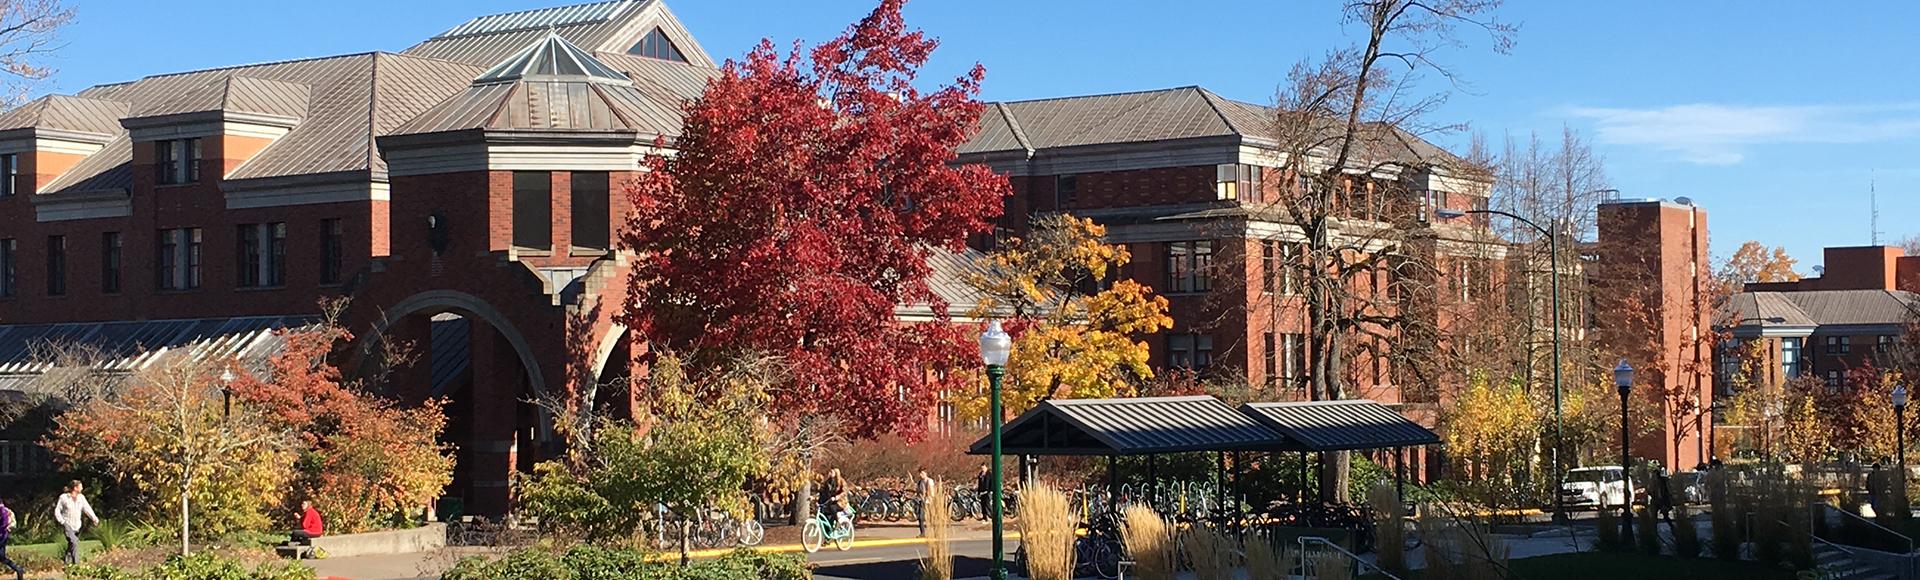 University of Oregon Campus - August 13 -16, 2019